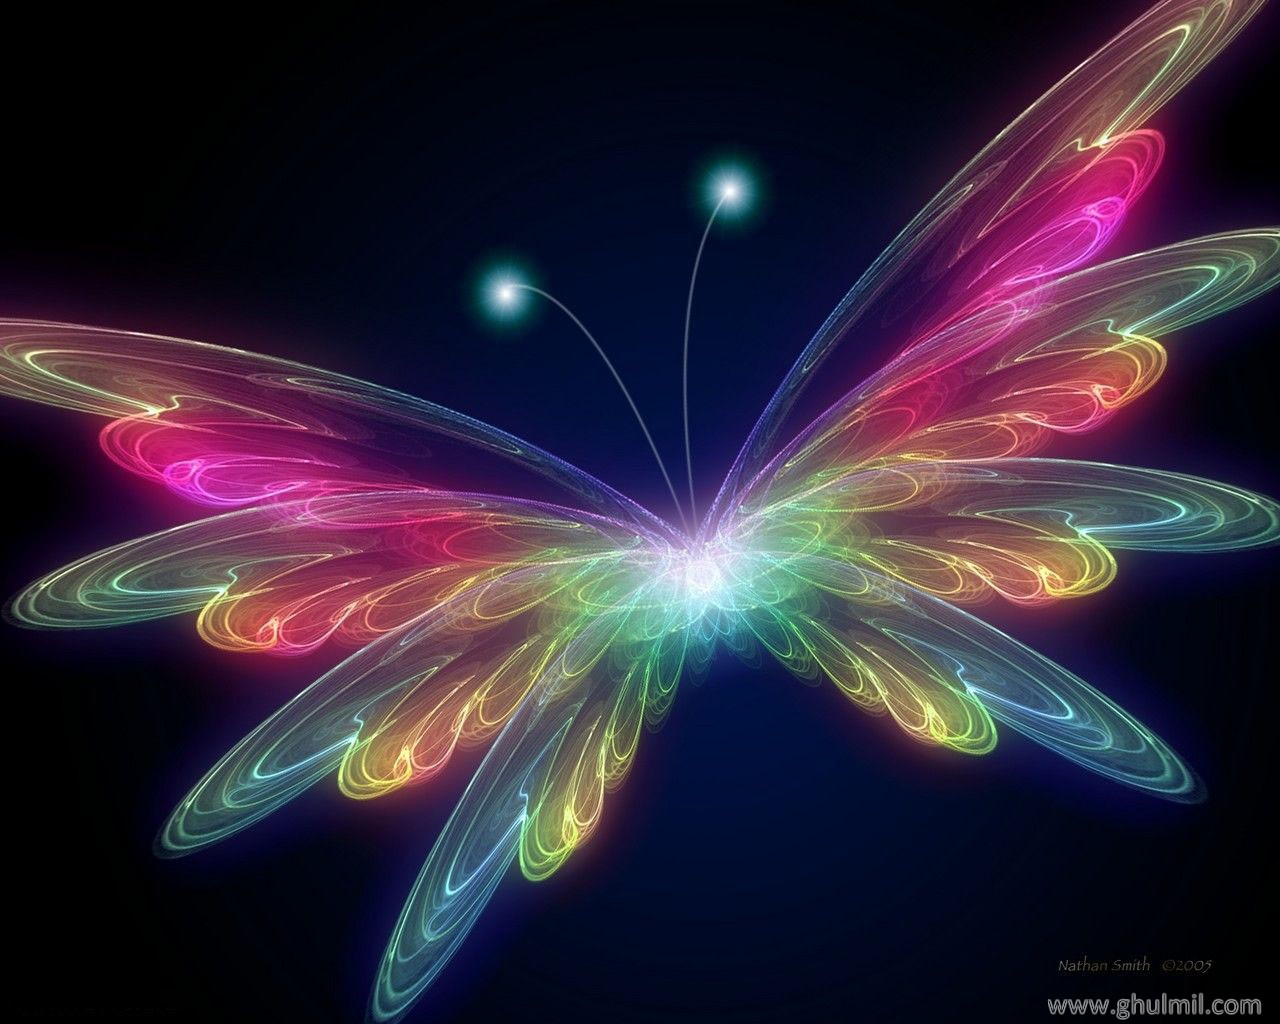 http://4.bp.blogspot.com/-OWeB1jNmAZ8/ToxKJFOnGoI/AAAAAAAAAI8/PKy9wVxC5e0/s1600/very-beautiful-3d-hd-hq-colorful-butterfly-wallpaper.jpg